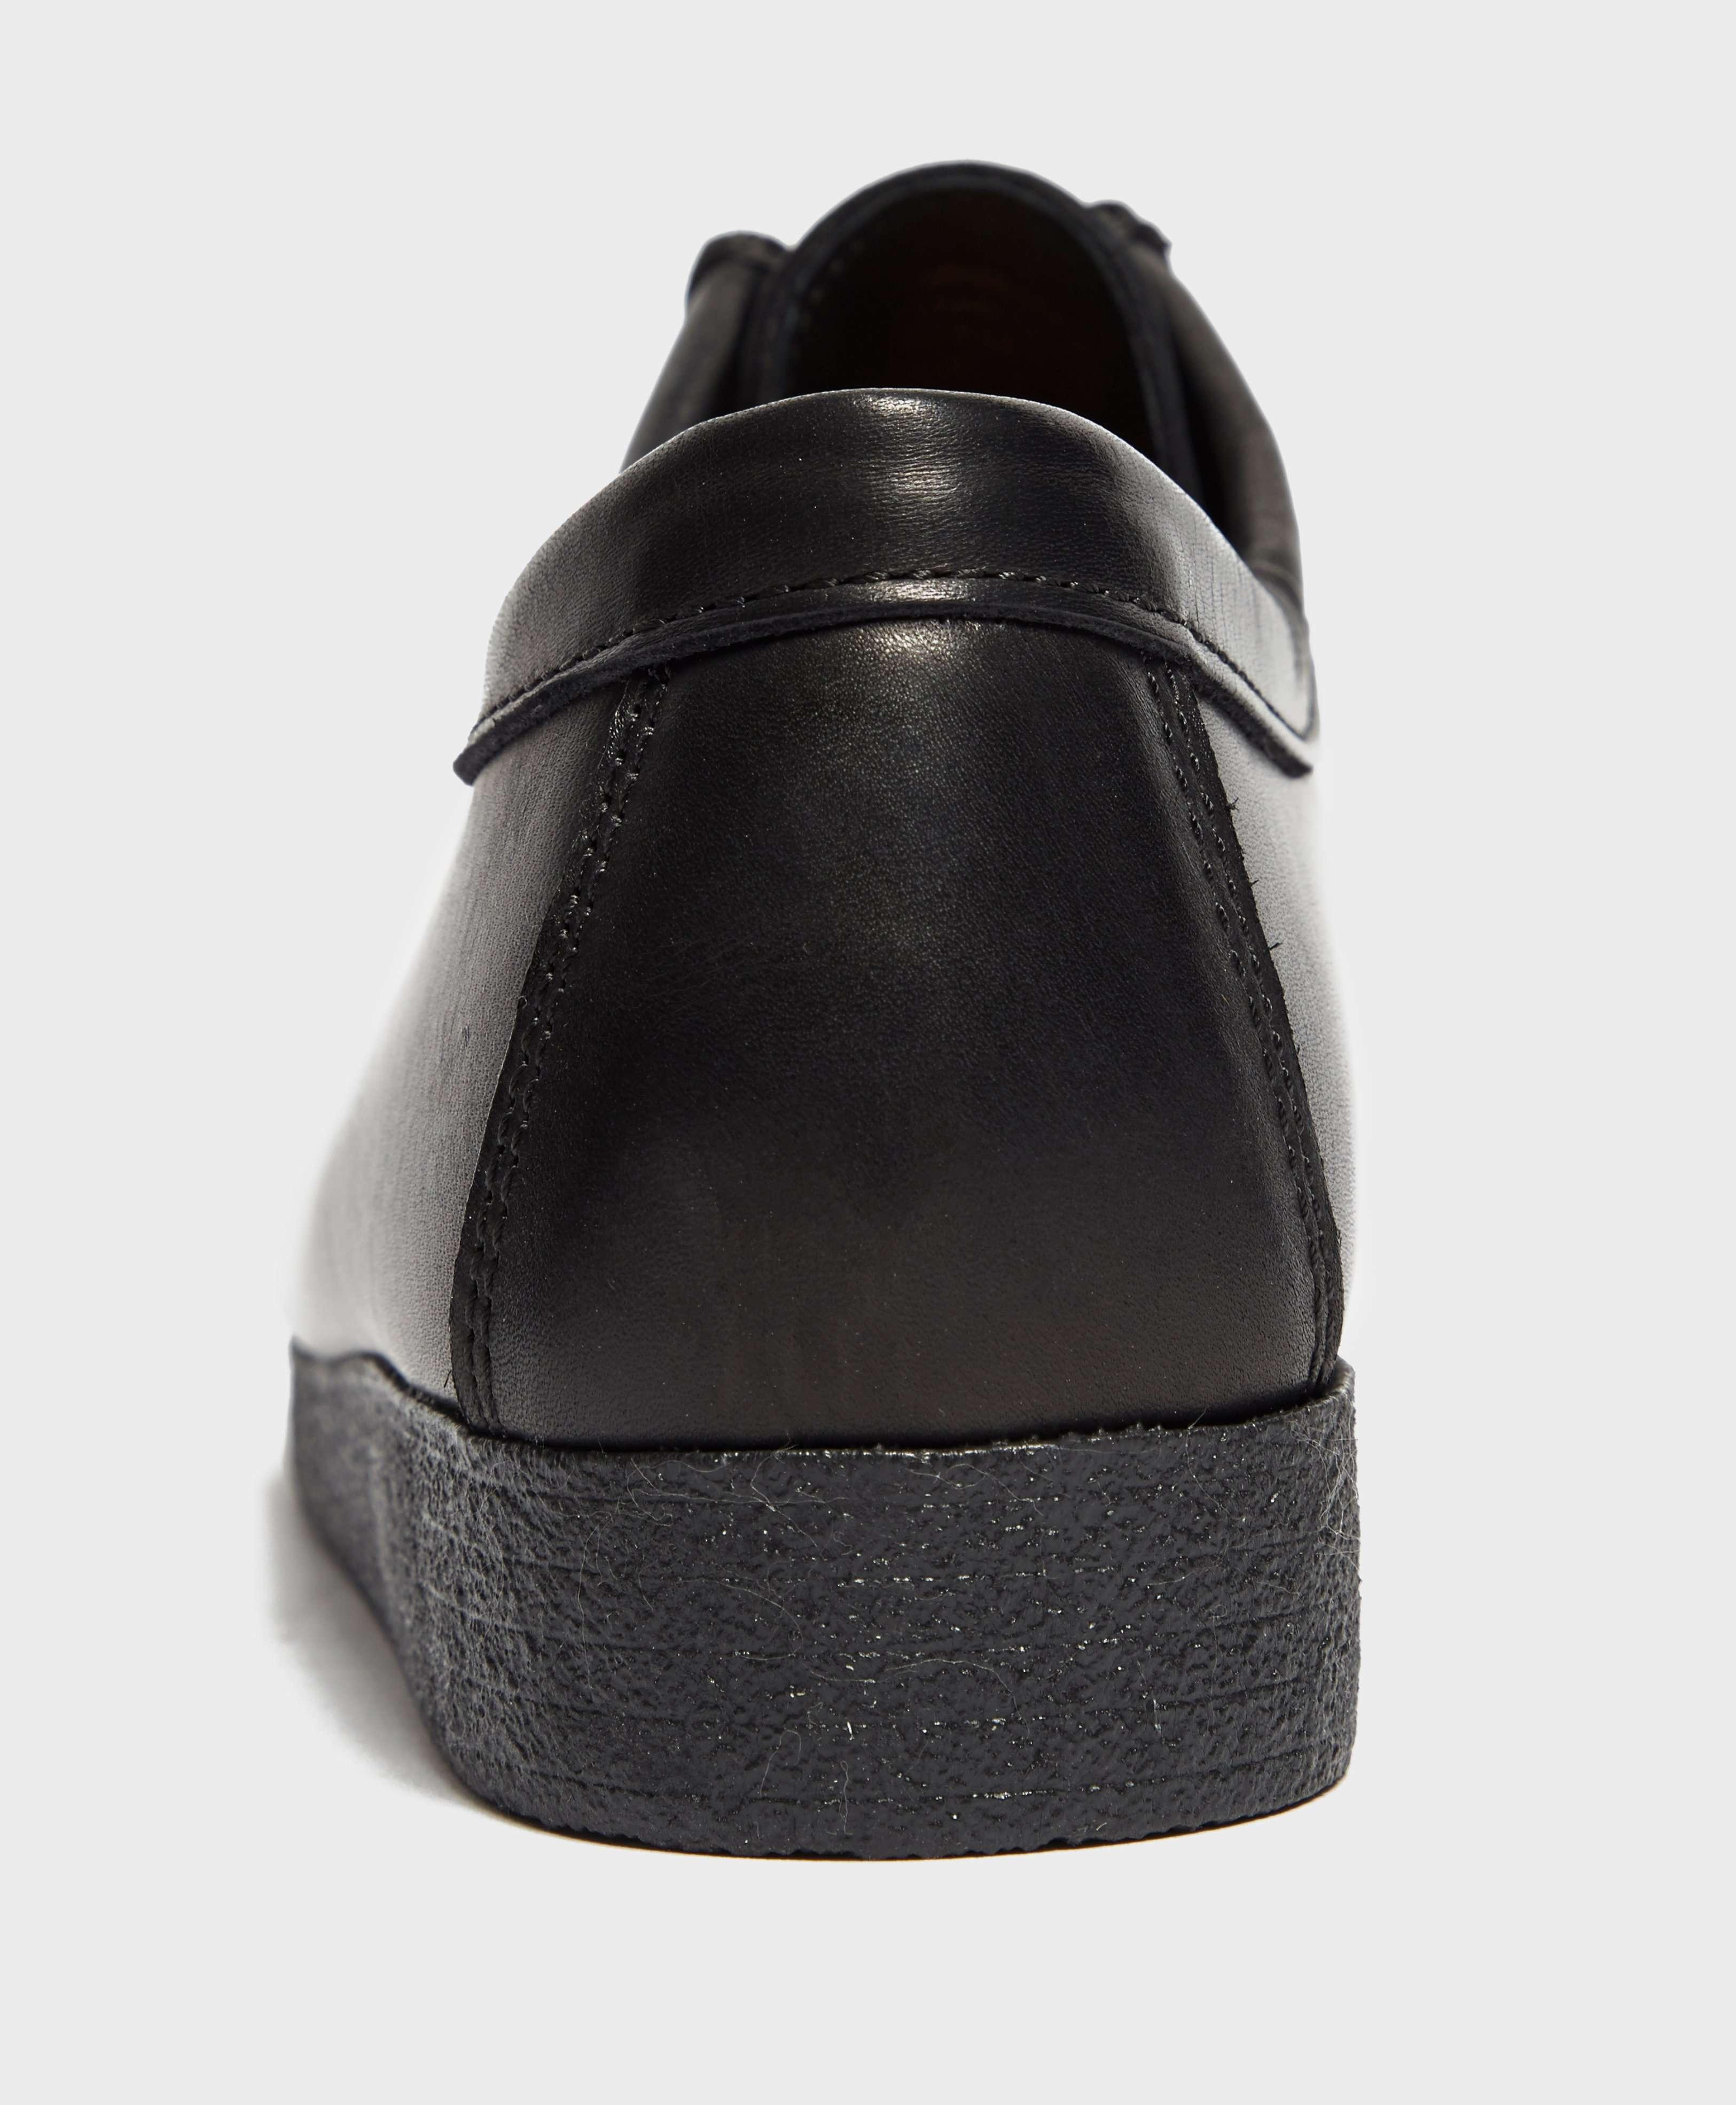 One True Saxon Ayadi Leather - Exclusive